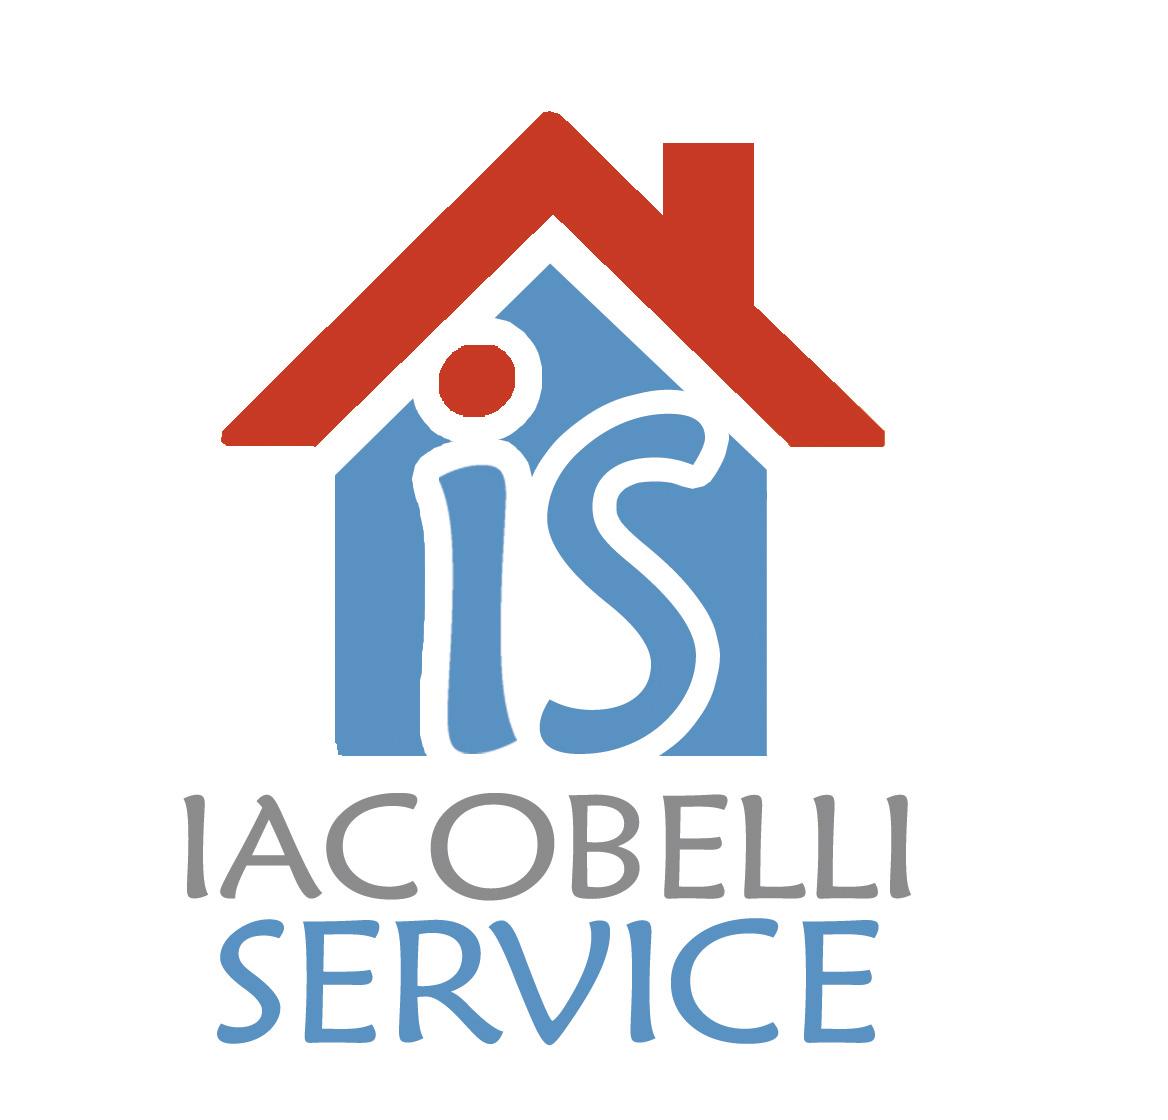 Iacobelli Service